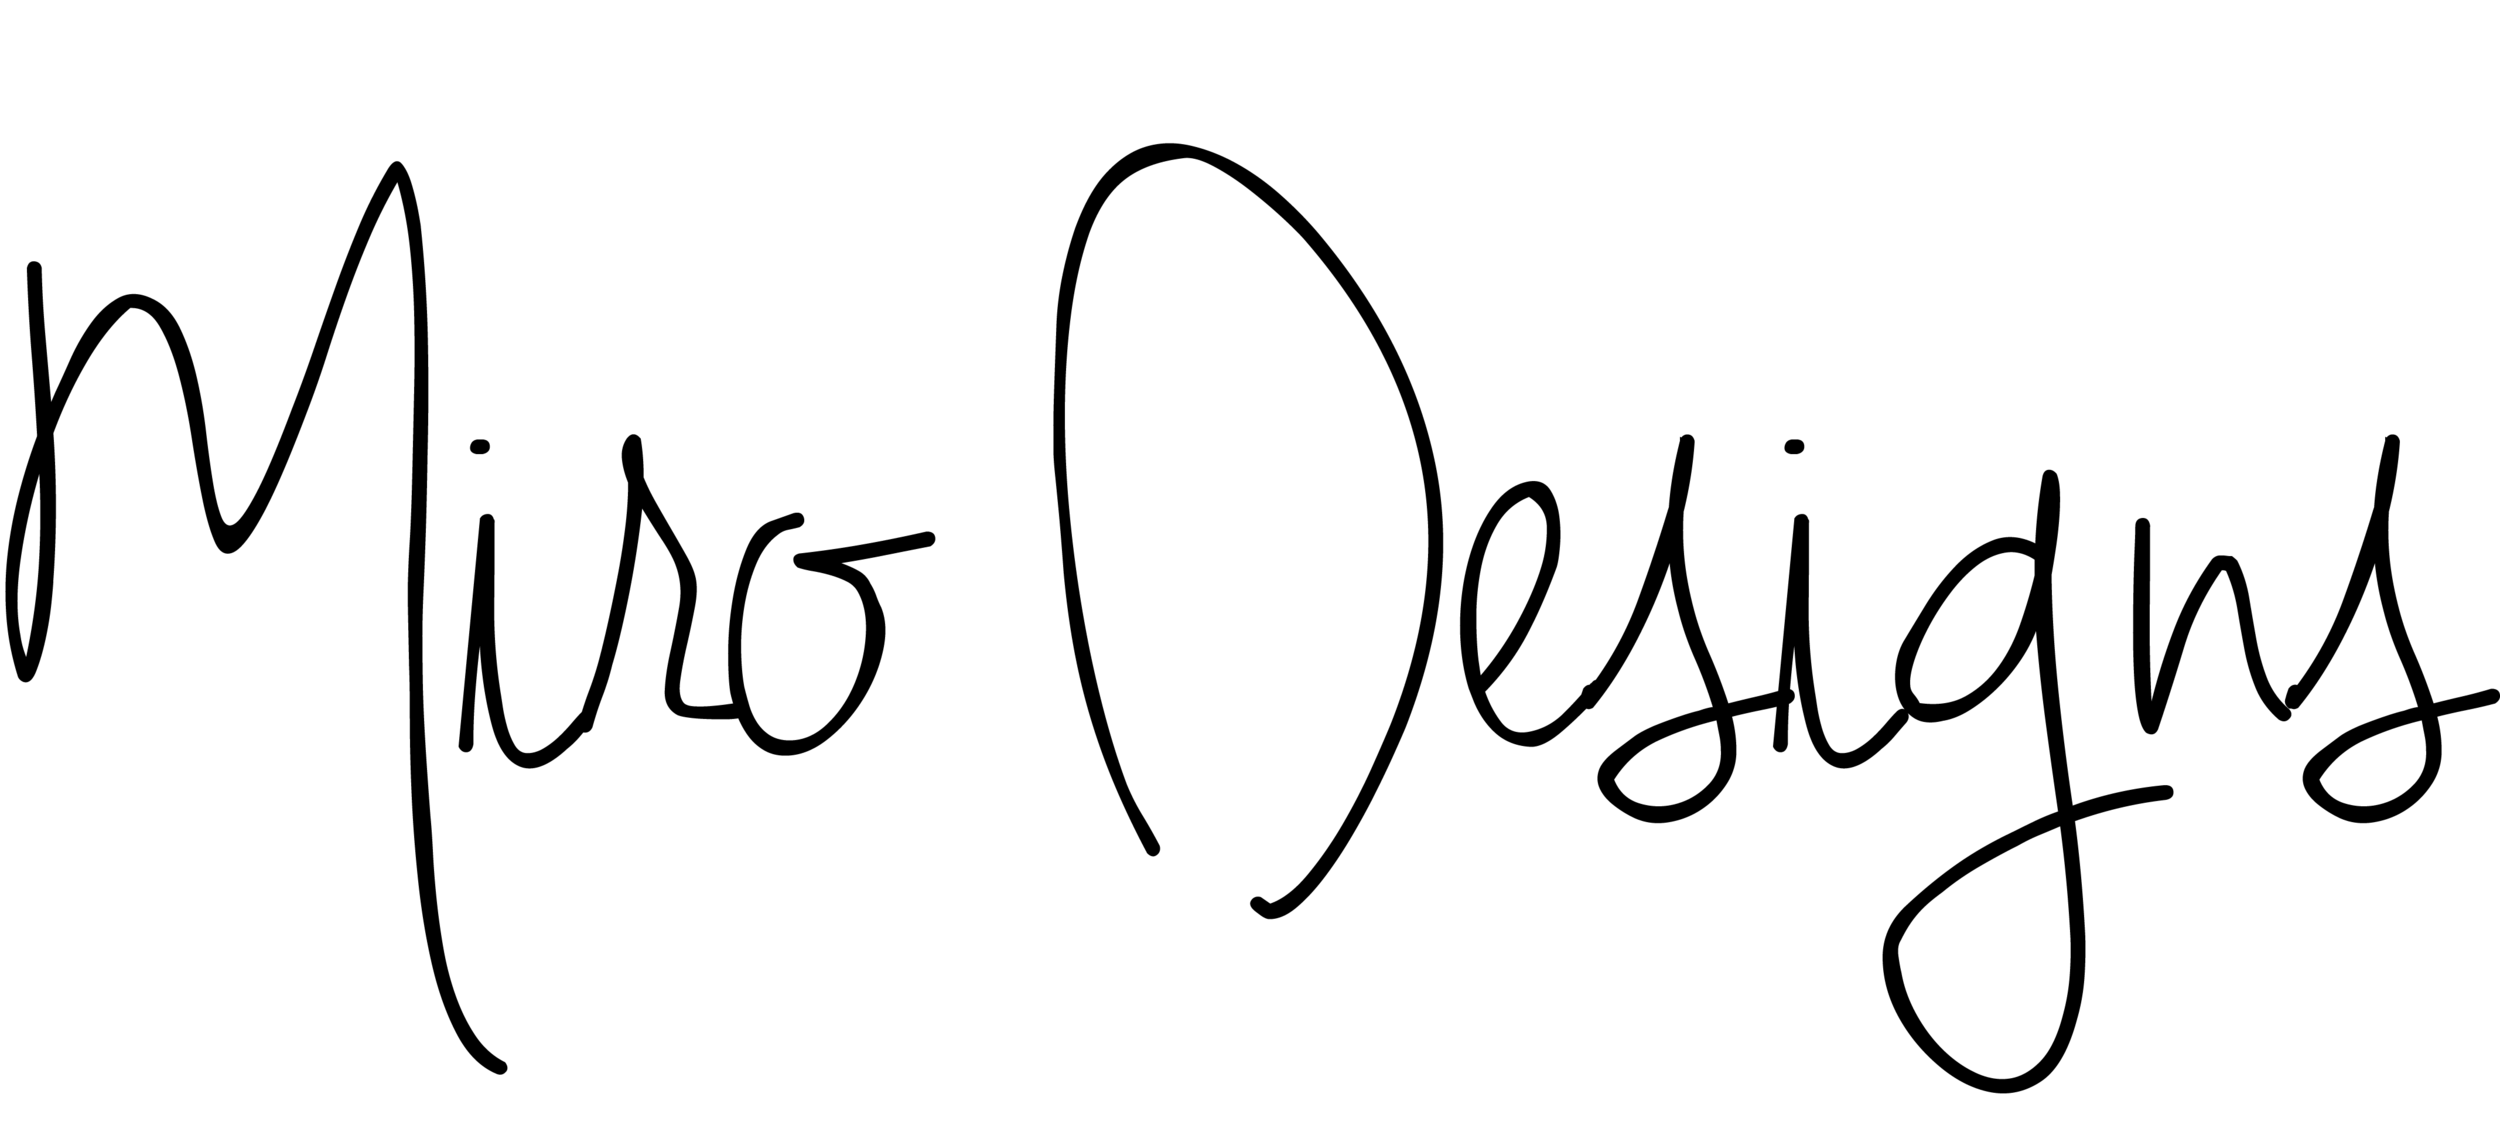 MIRO DESIGNS logo transparent.png